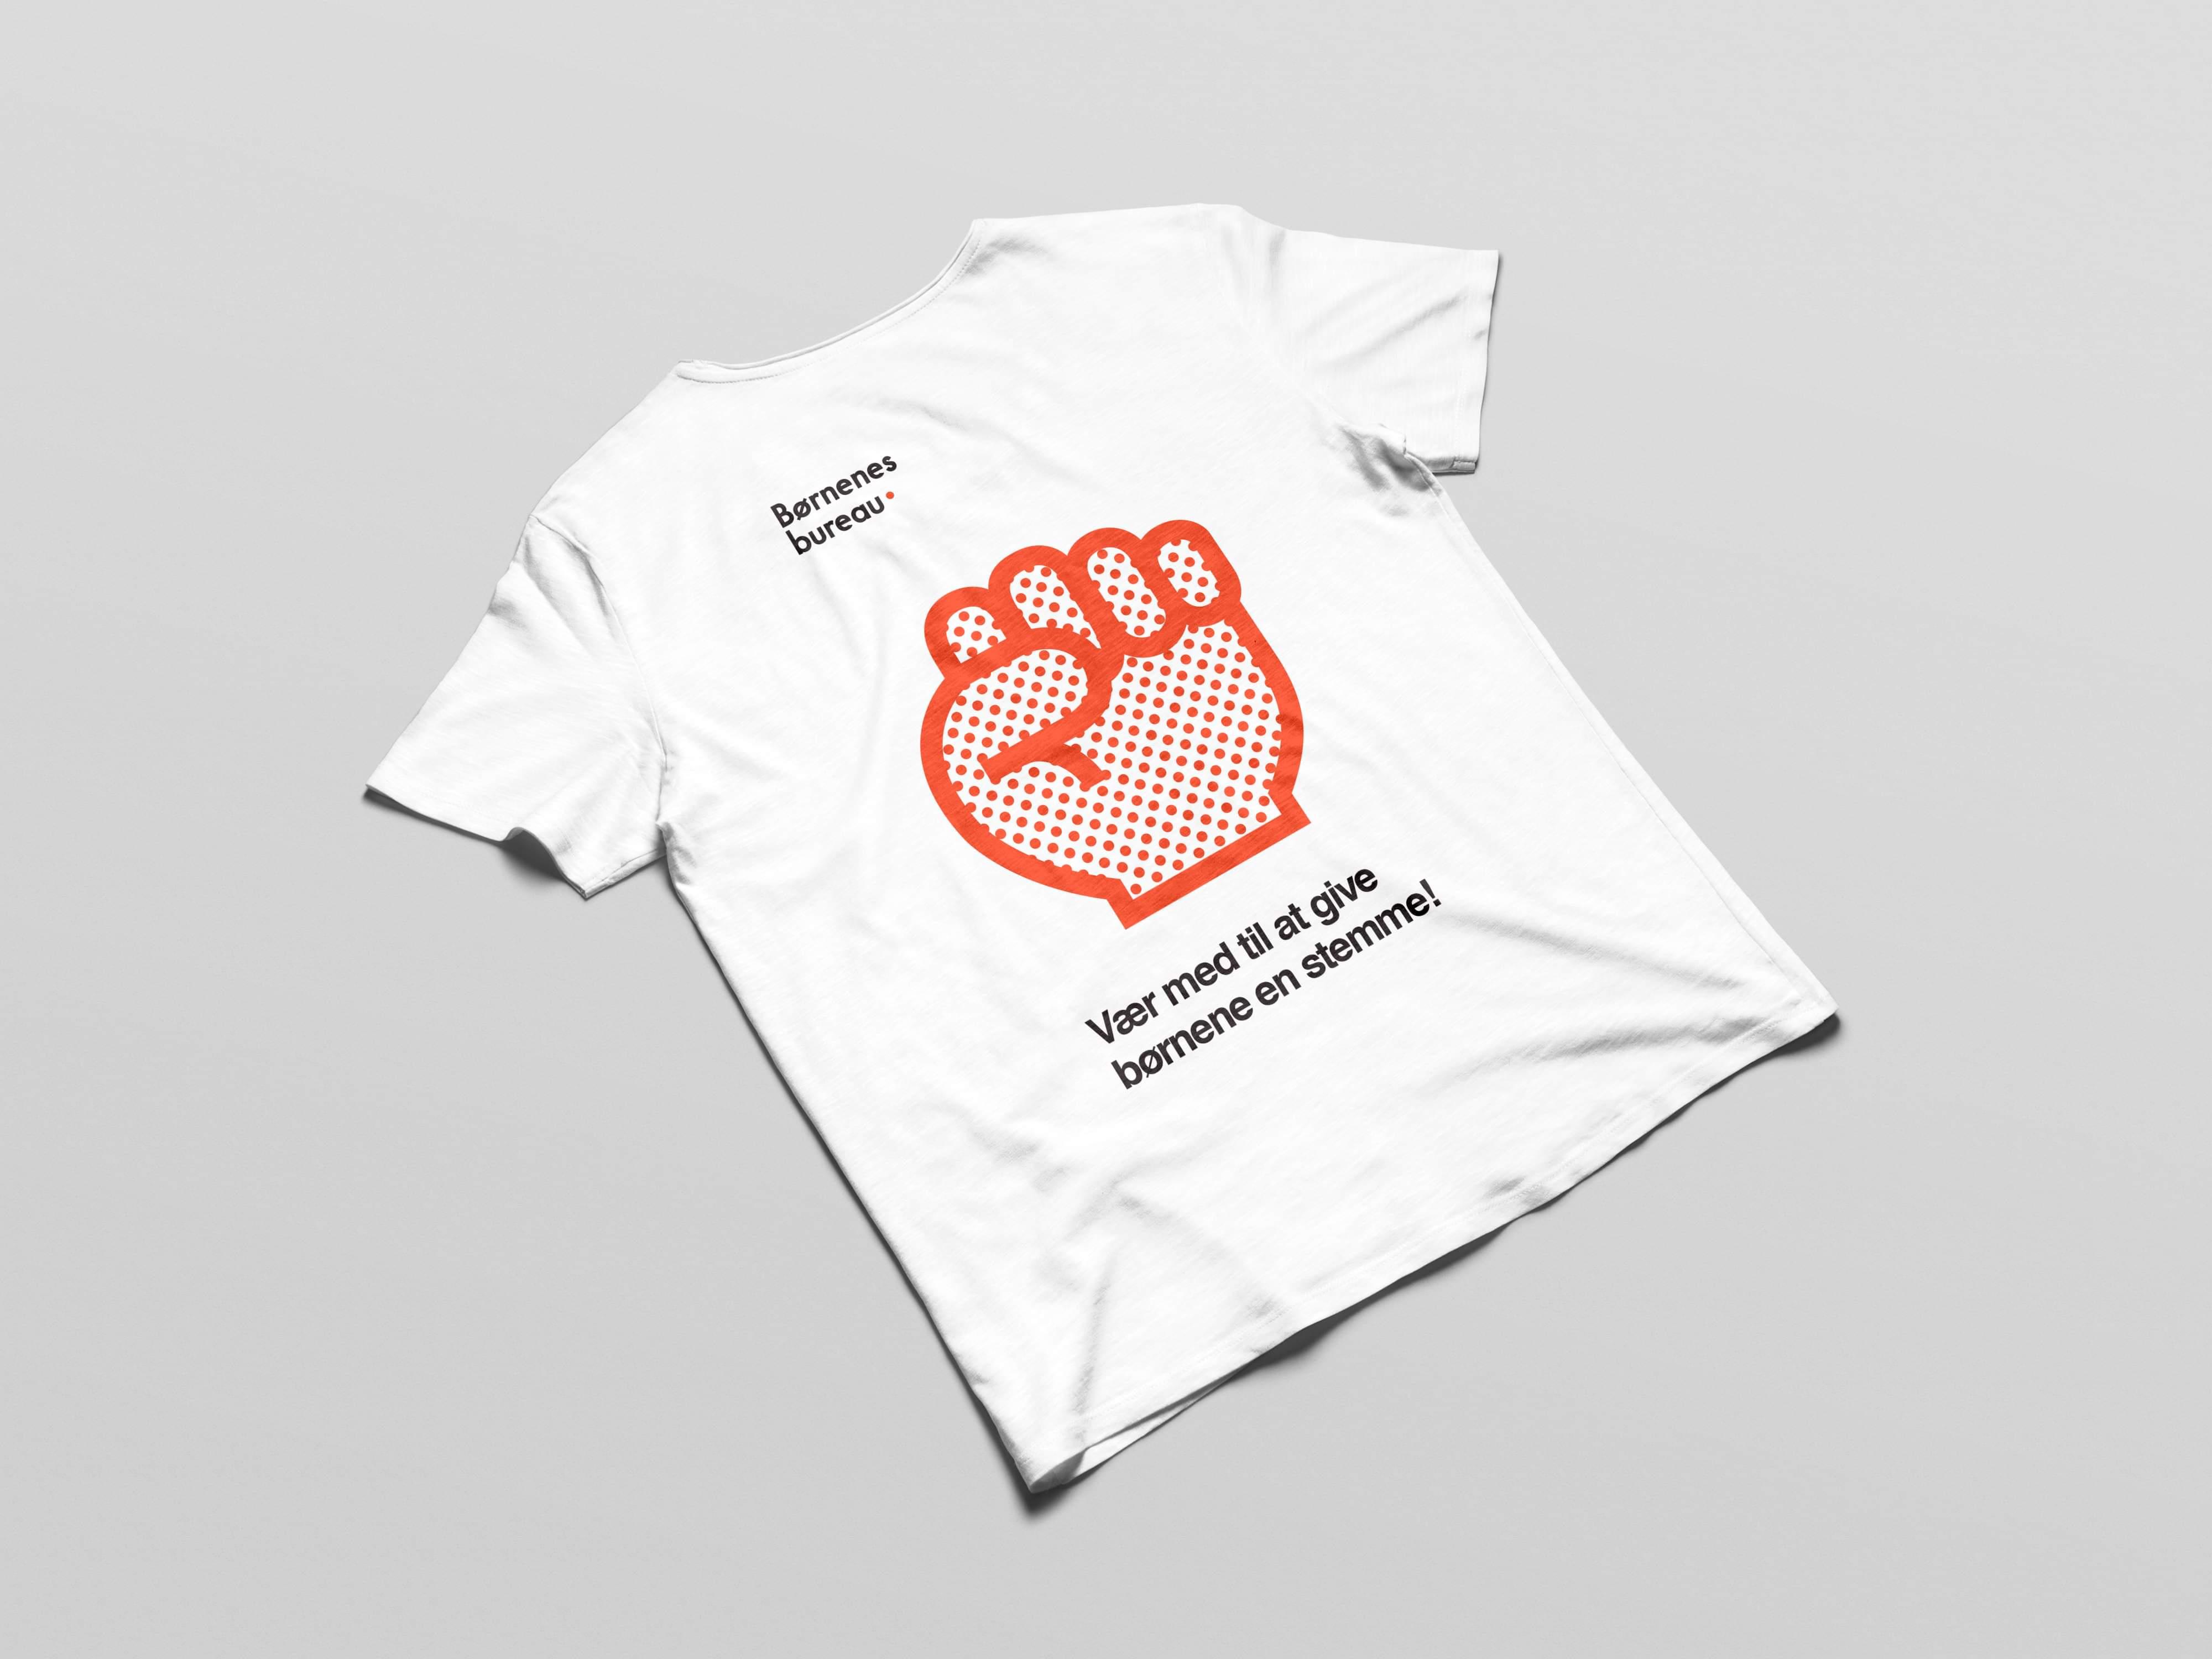 Børnenes bureau t-shirt